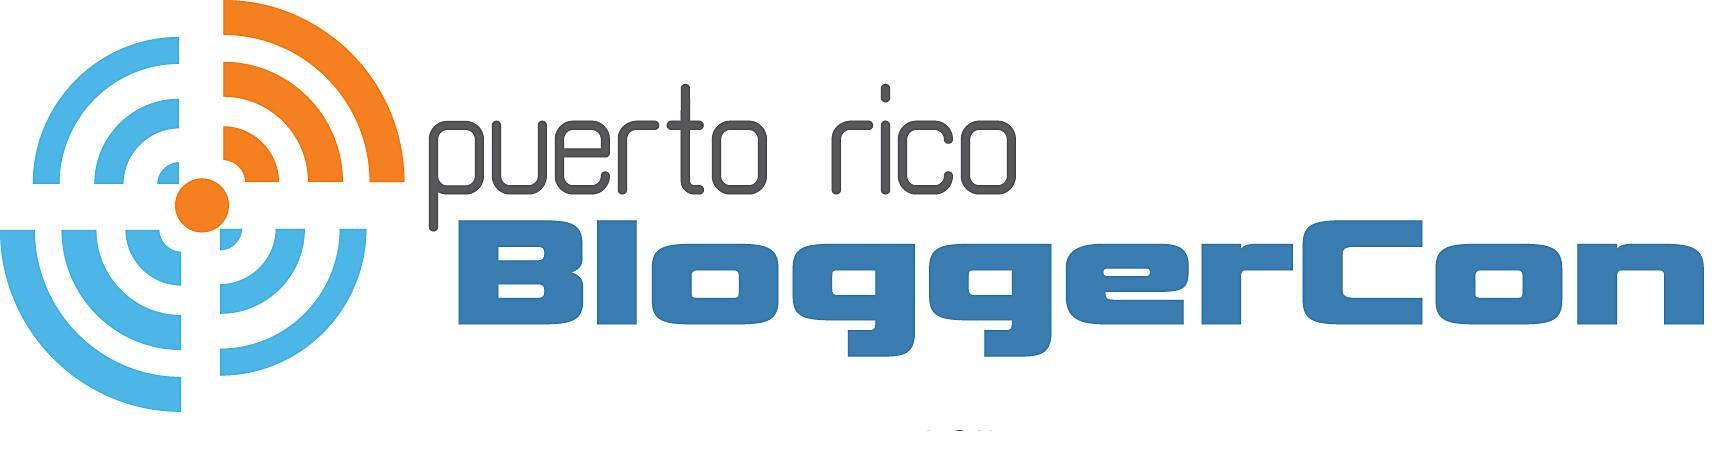 logoprbloggerconnospons-b4d009bc51ccc14fd6349068a44f1d74.jpg